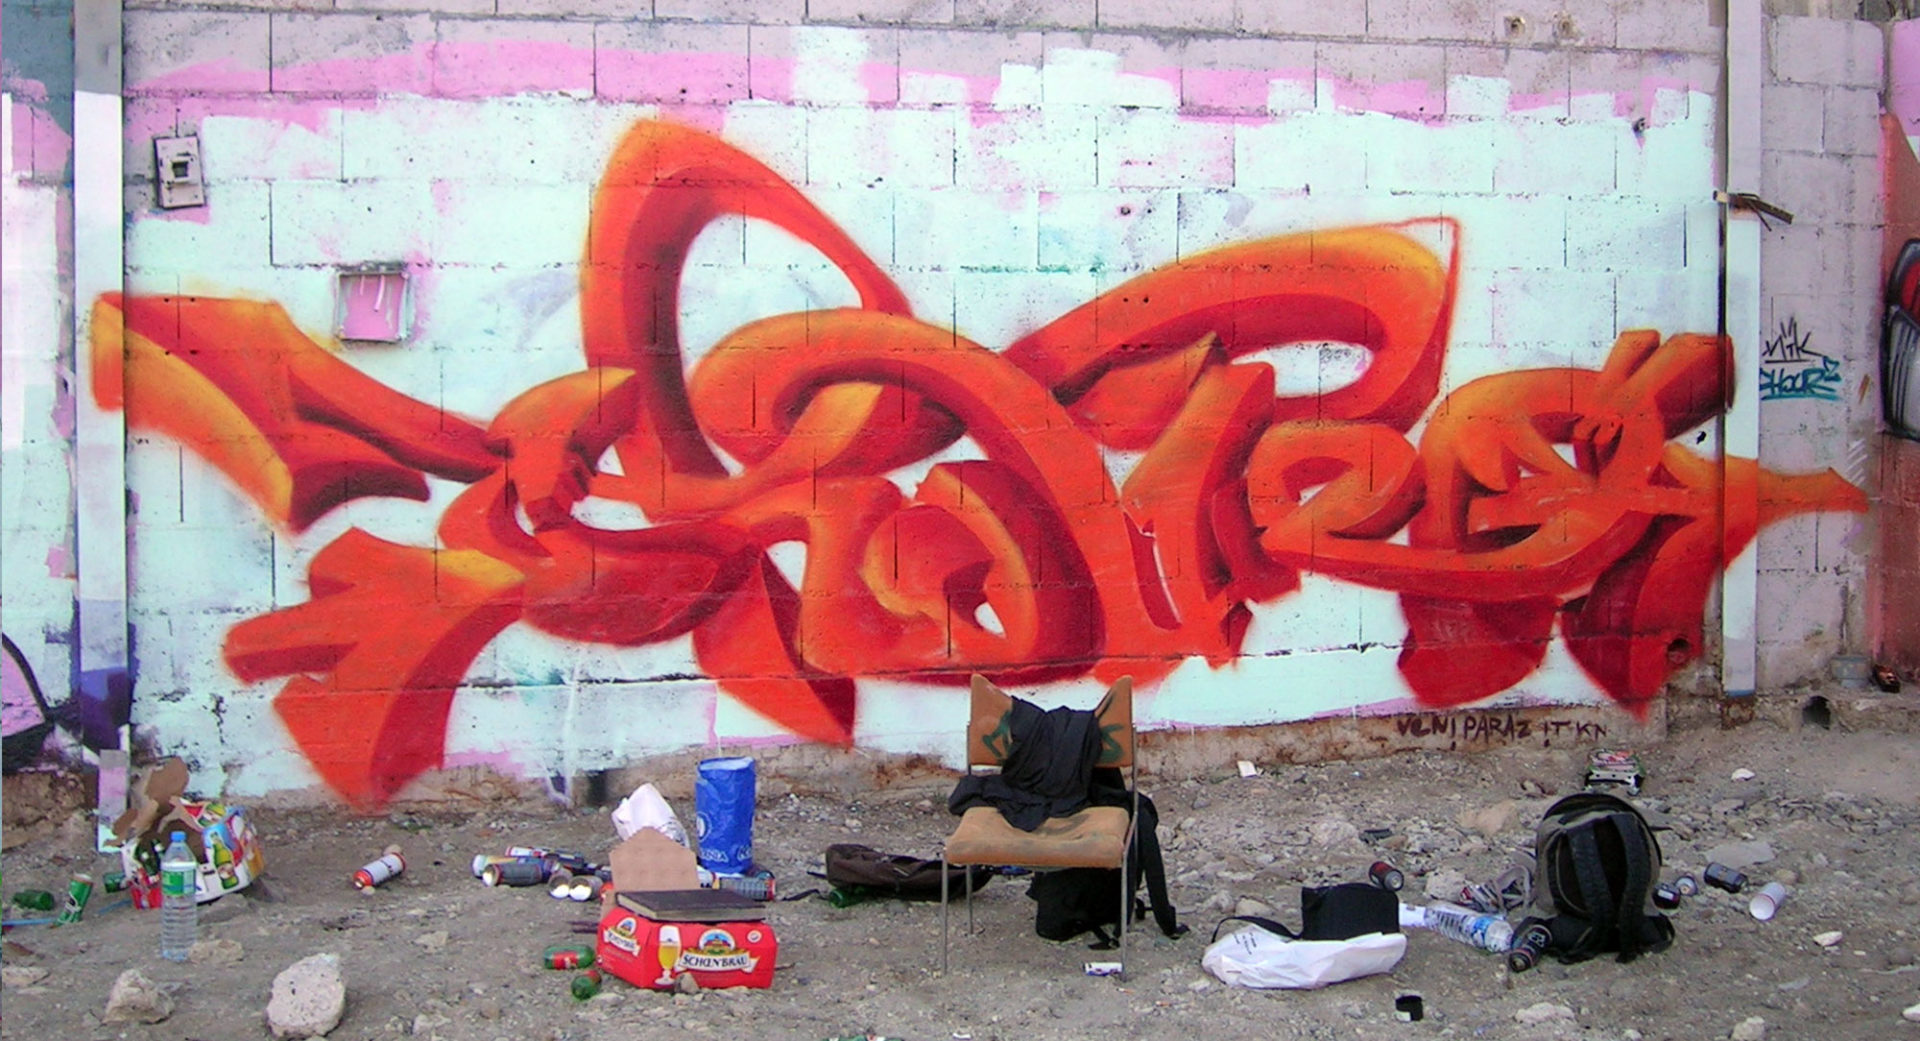 Chour2 - Graffiti - Brad Tout - Riom